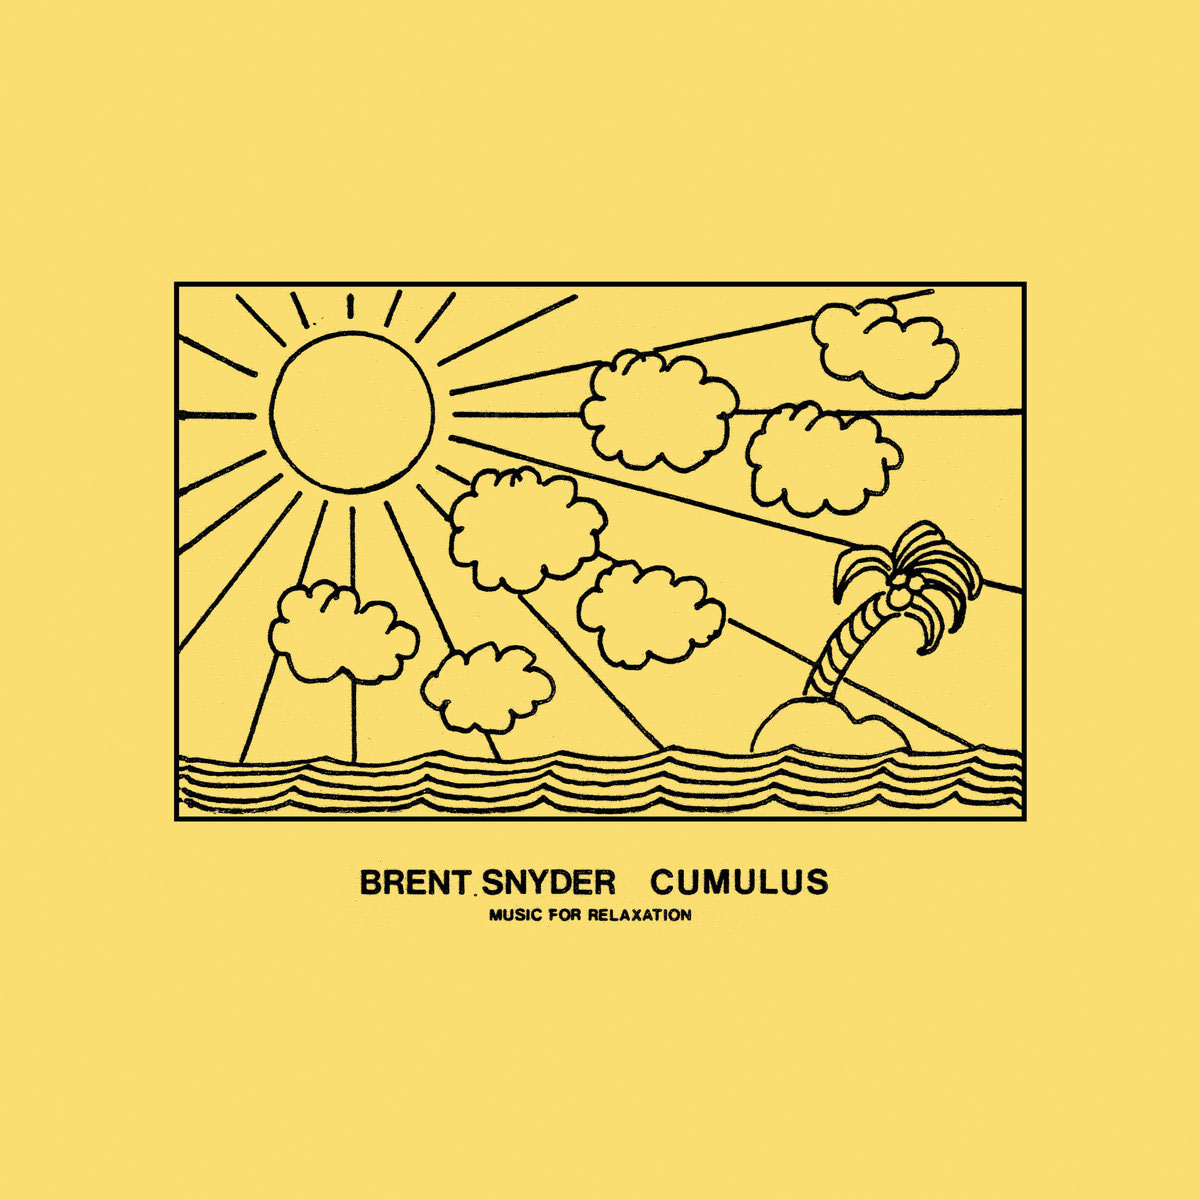 Brent Snyder Cumulus Morning Trip LP, Reissue